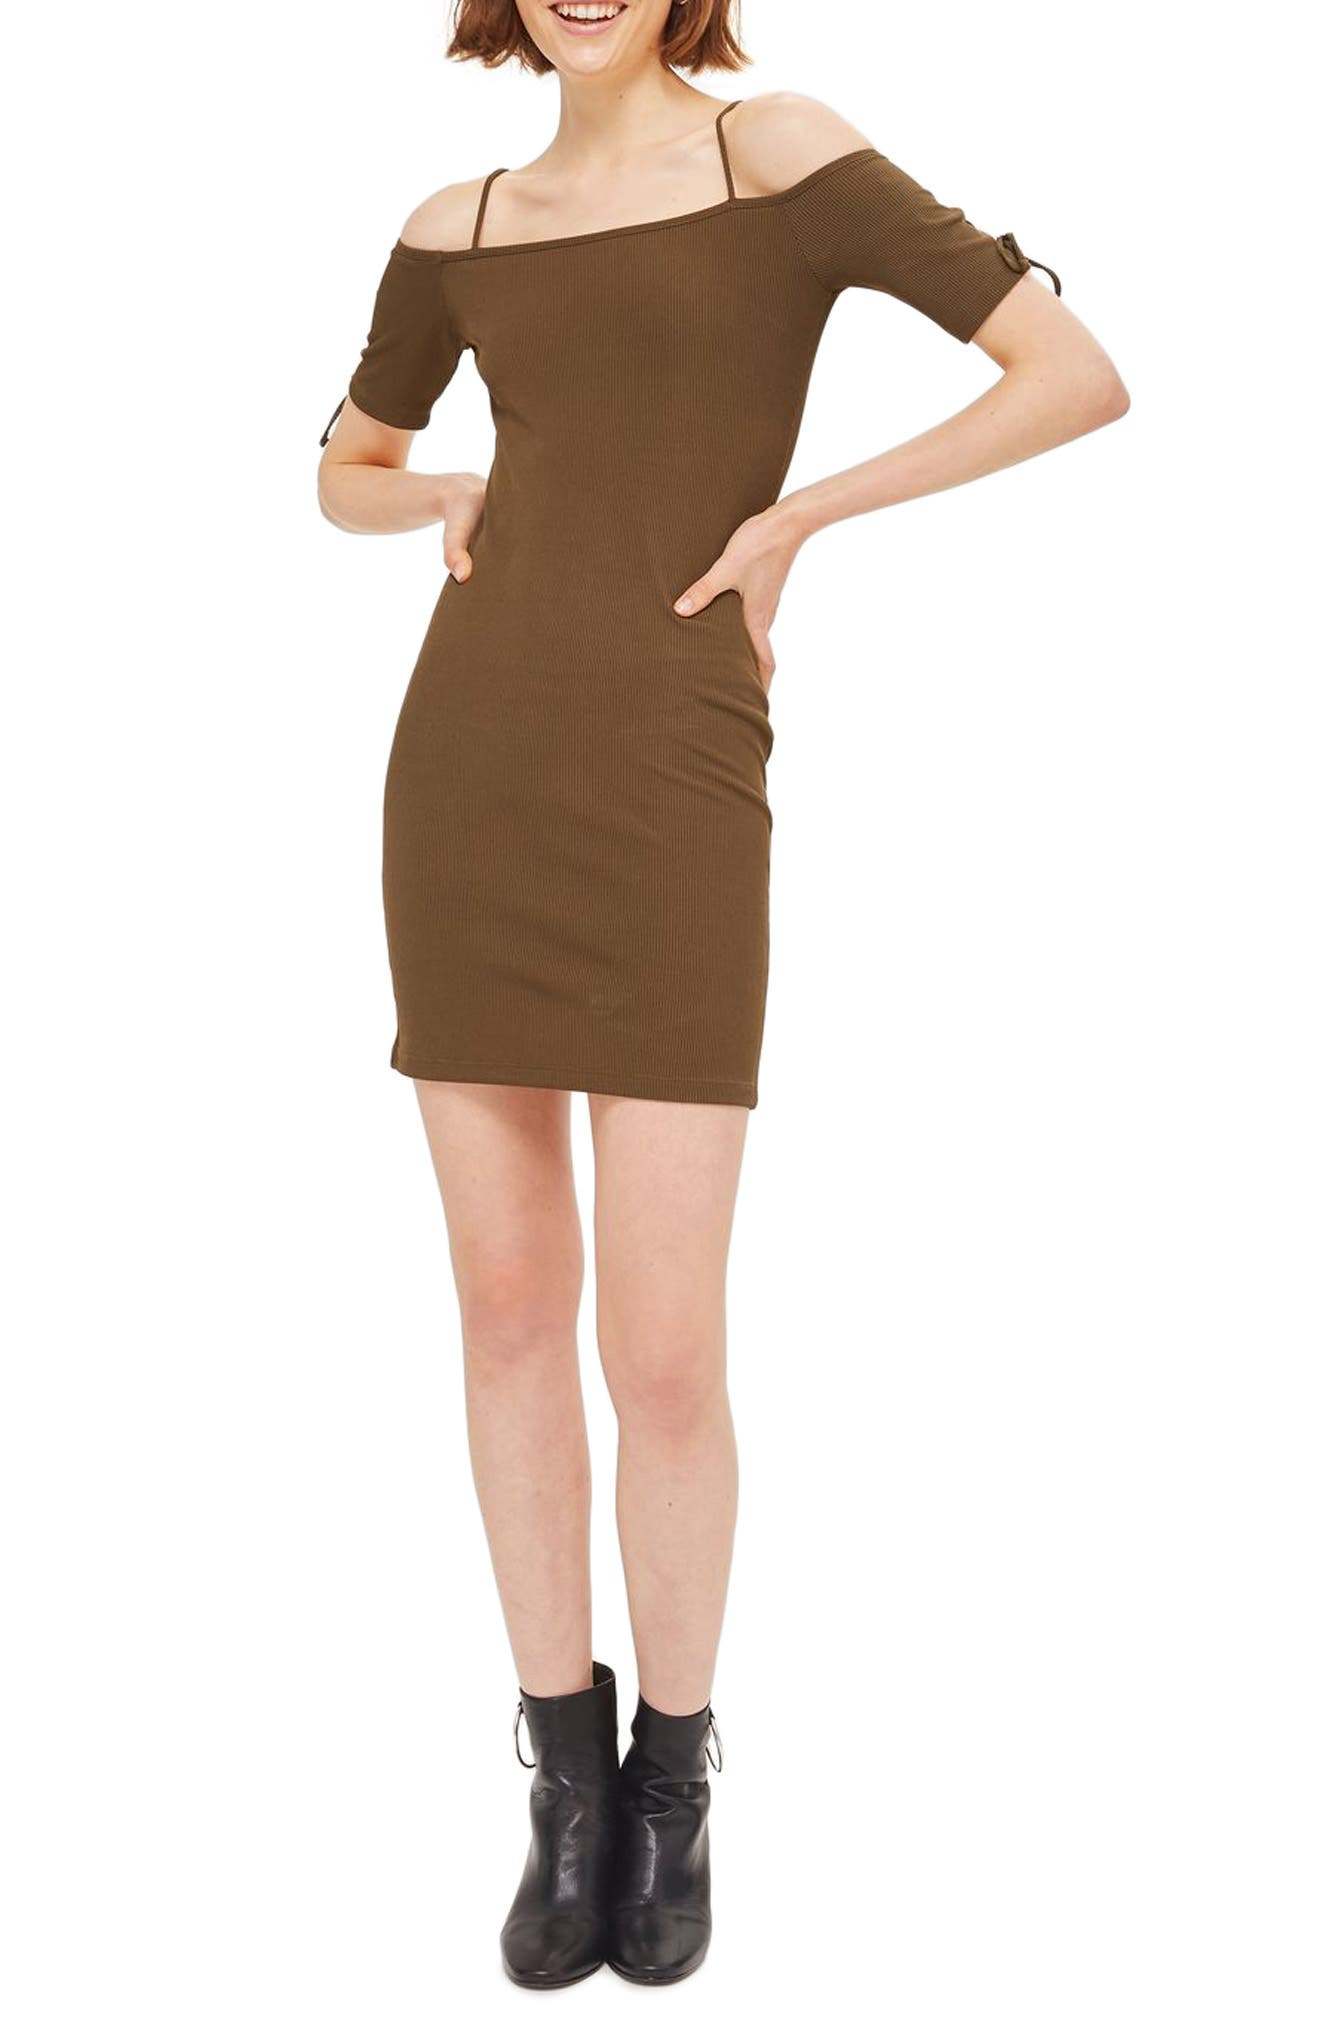 Alternate Image 1 Selected - Topshop Bardot Lace-Up Sleeve Dress